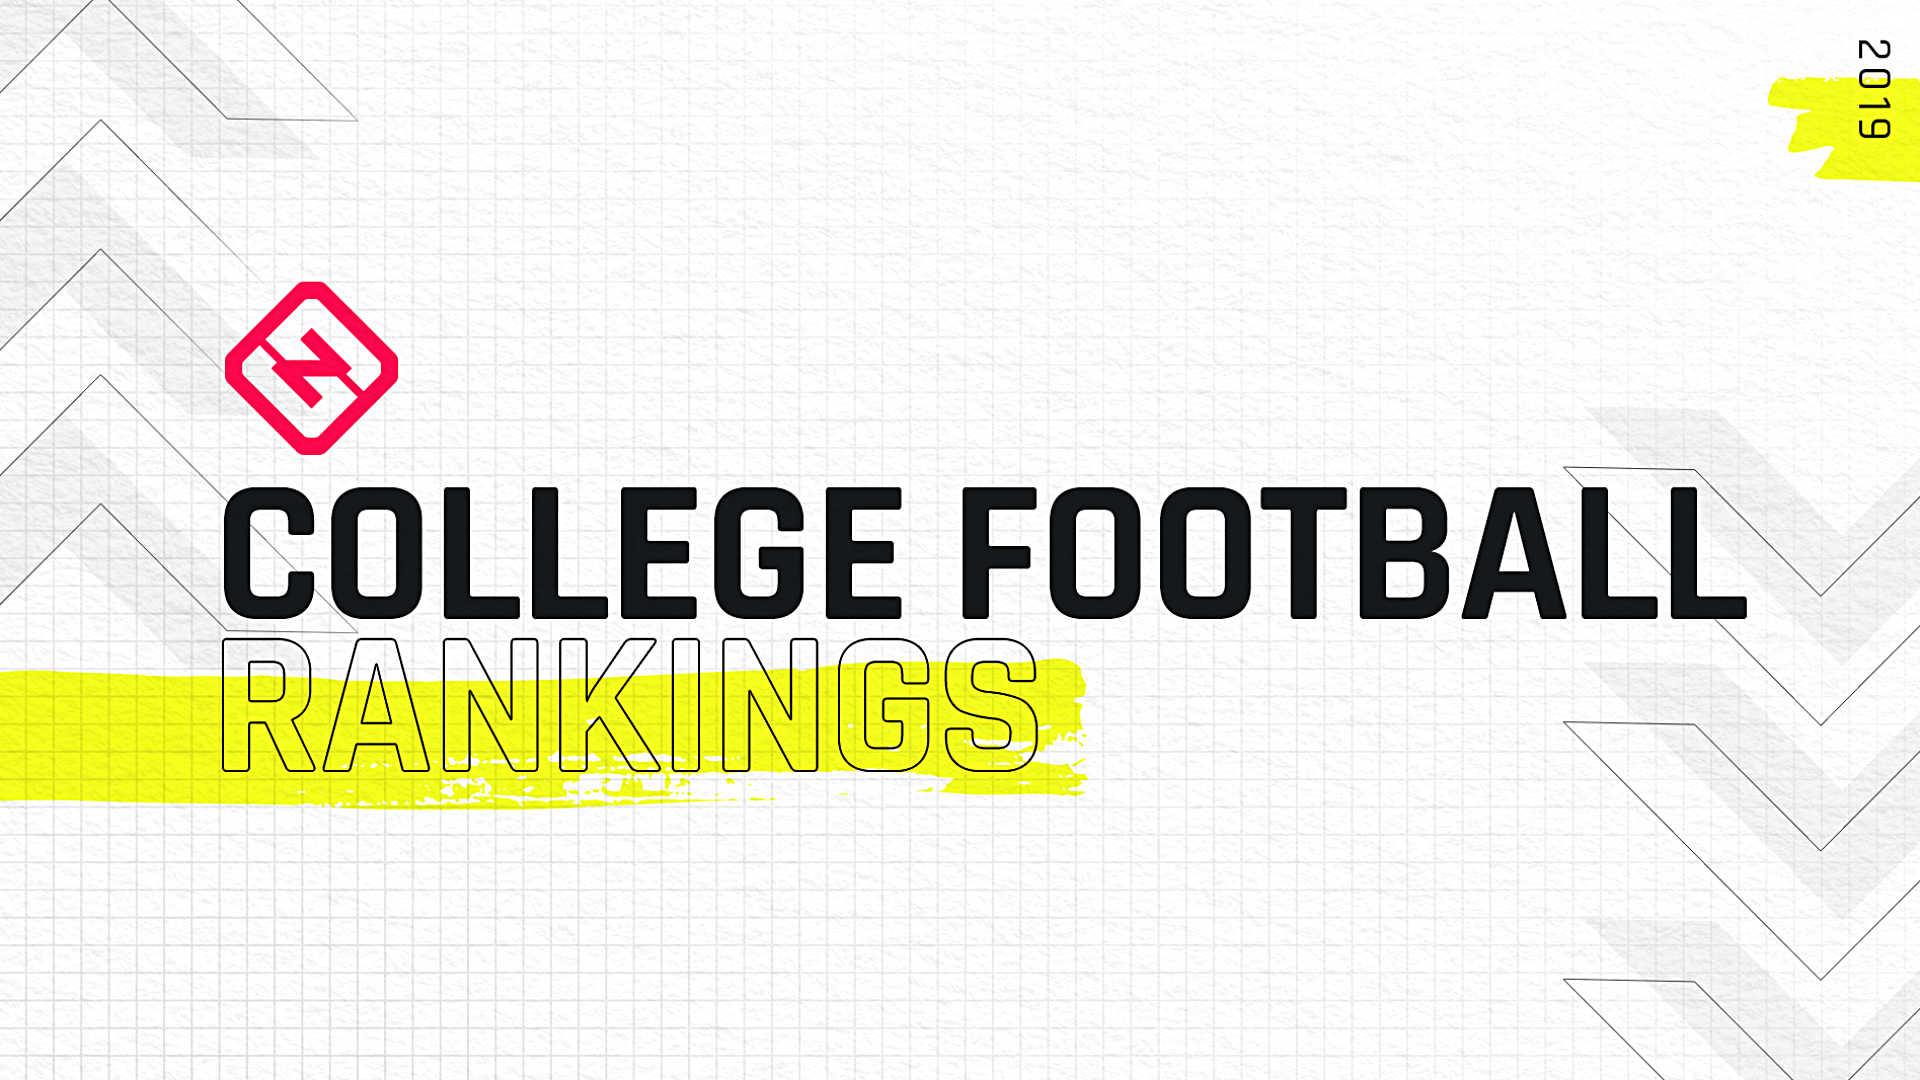 fbs football rankings 2020